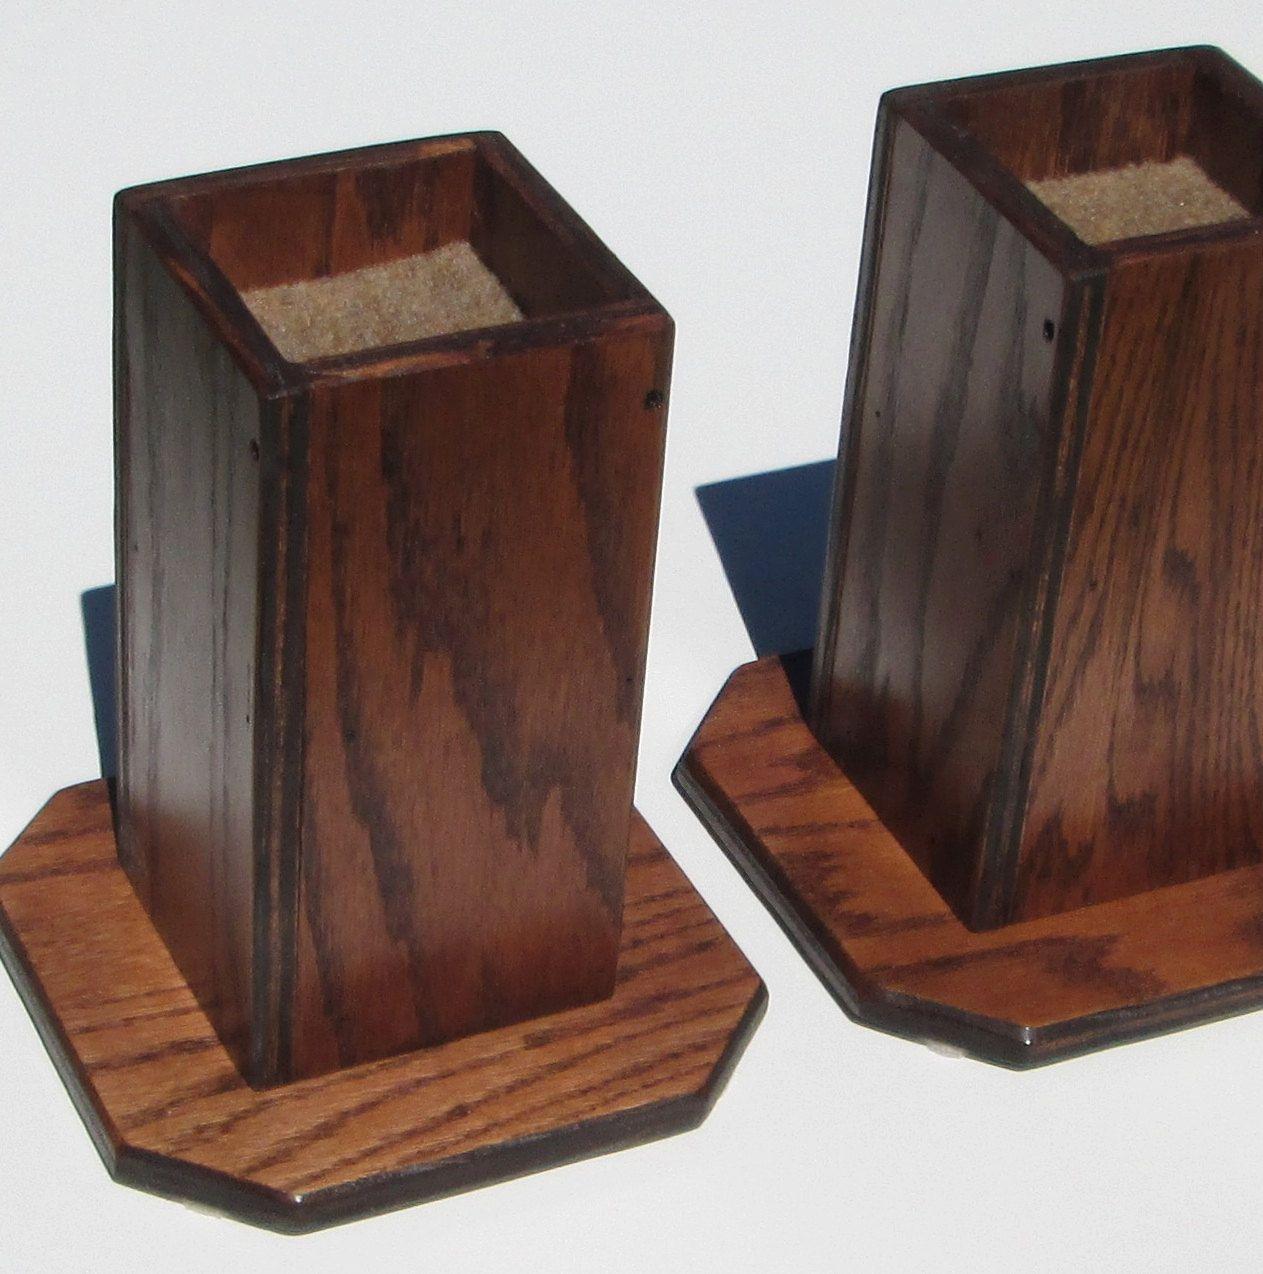 Furniture Risers 6 Inch All Wood Construction Sleek By Odyssey359 97 00 Furniture Risers Wood Construction Sturdy Furniture